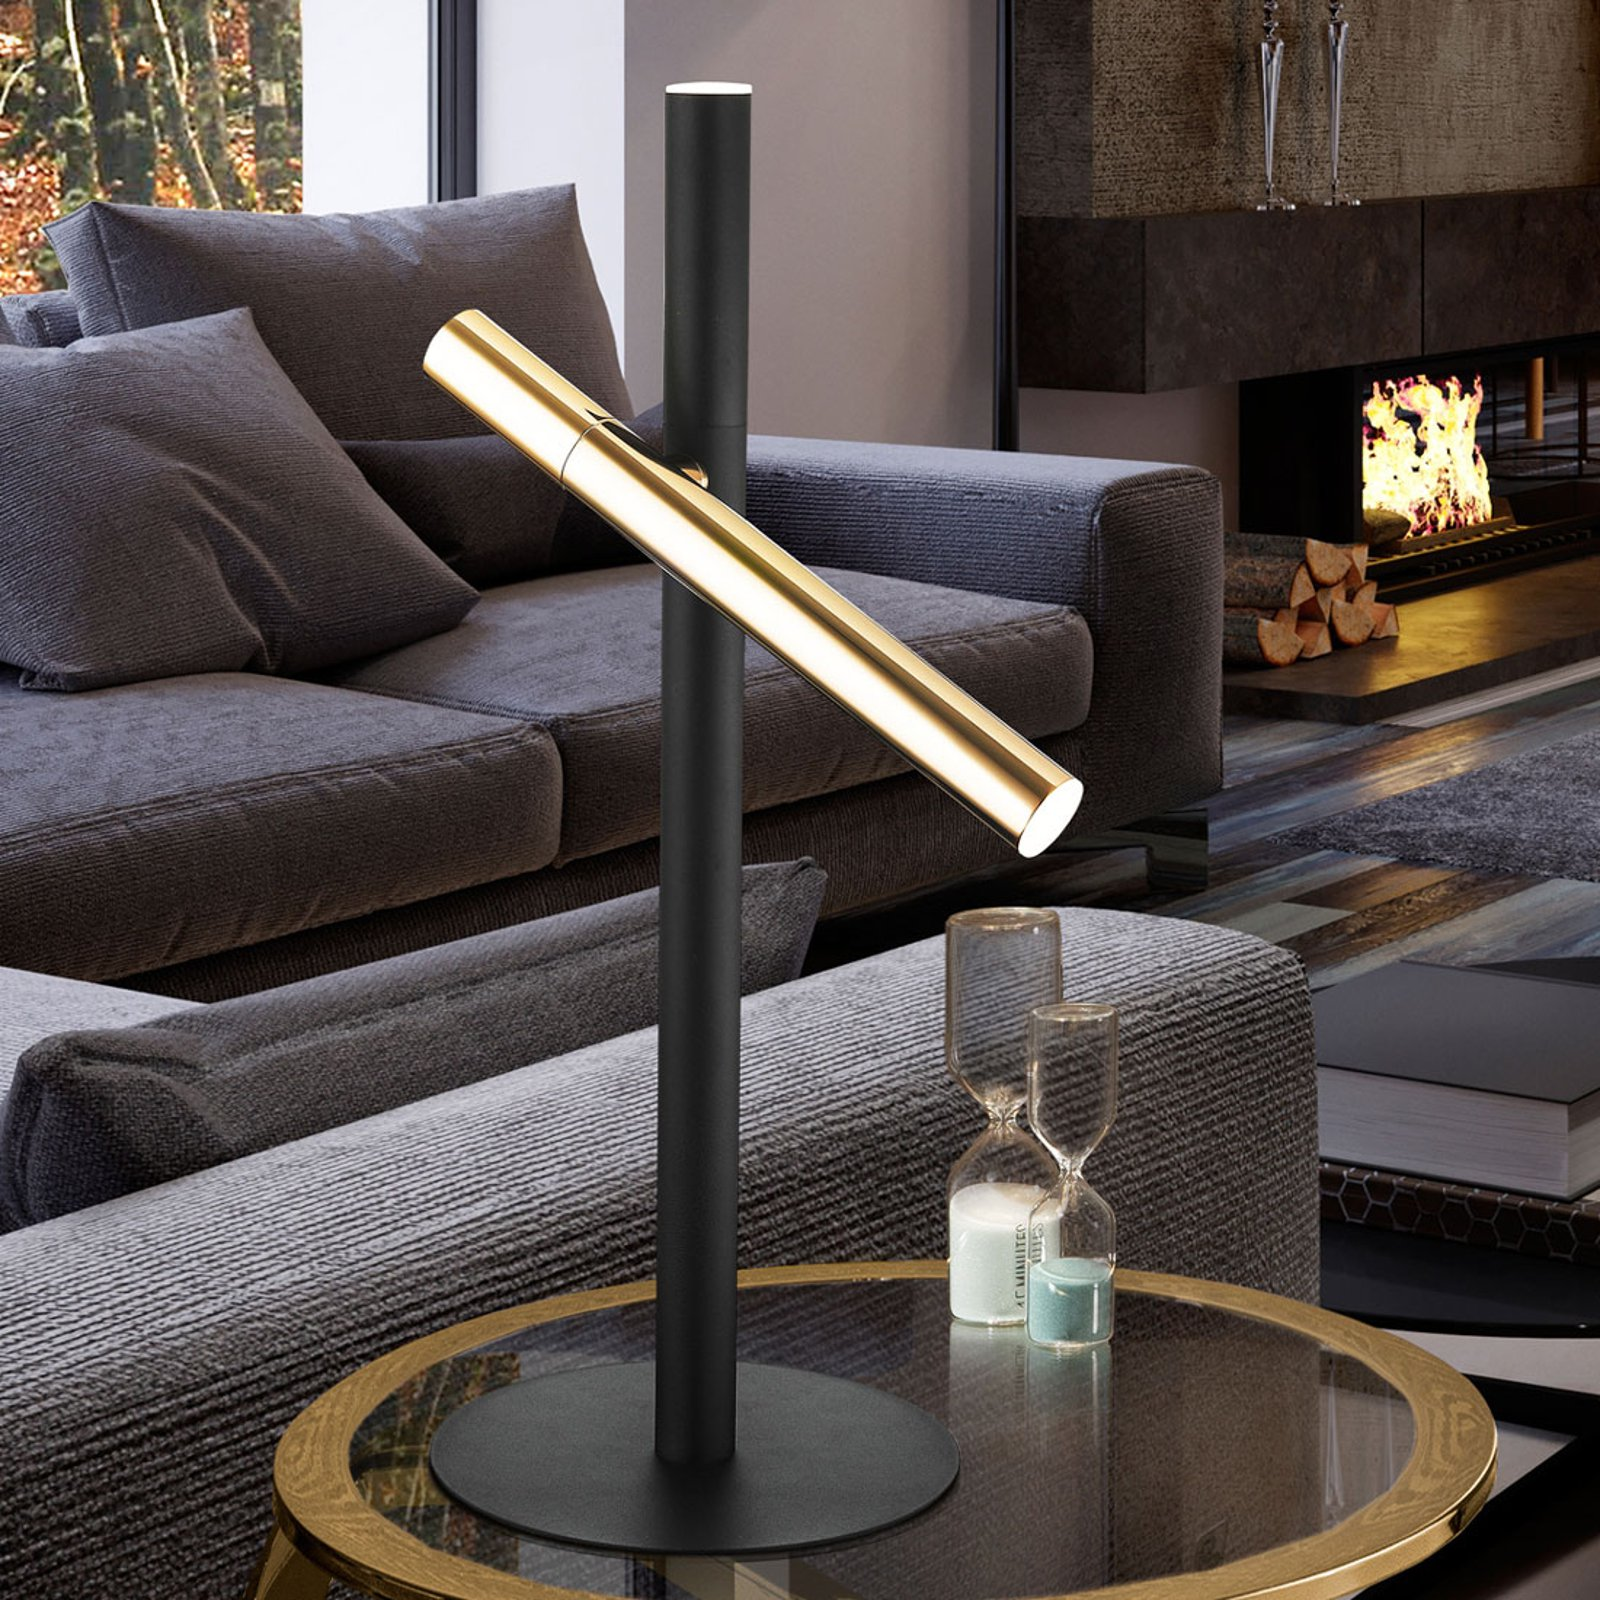 LED-bordlampe Varas, svart/gull, 2 lyskilder